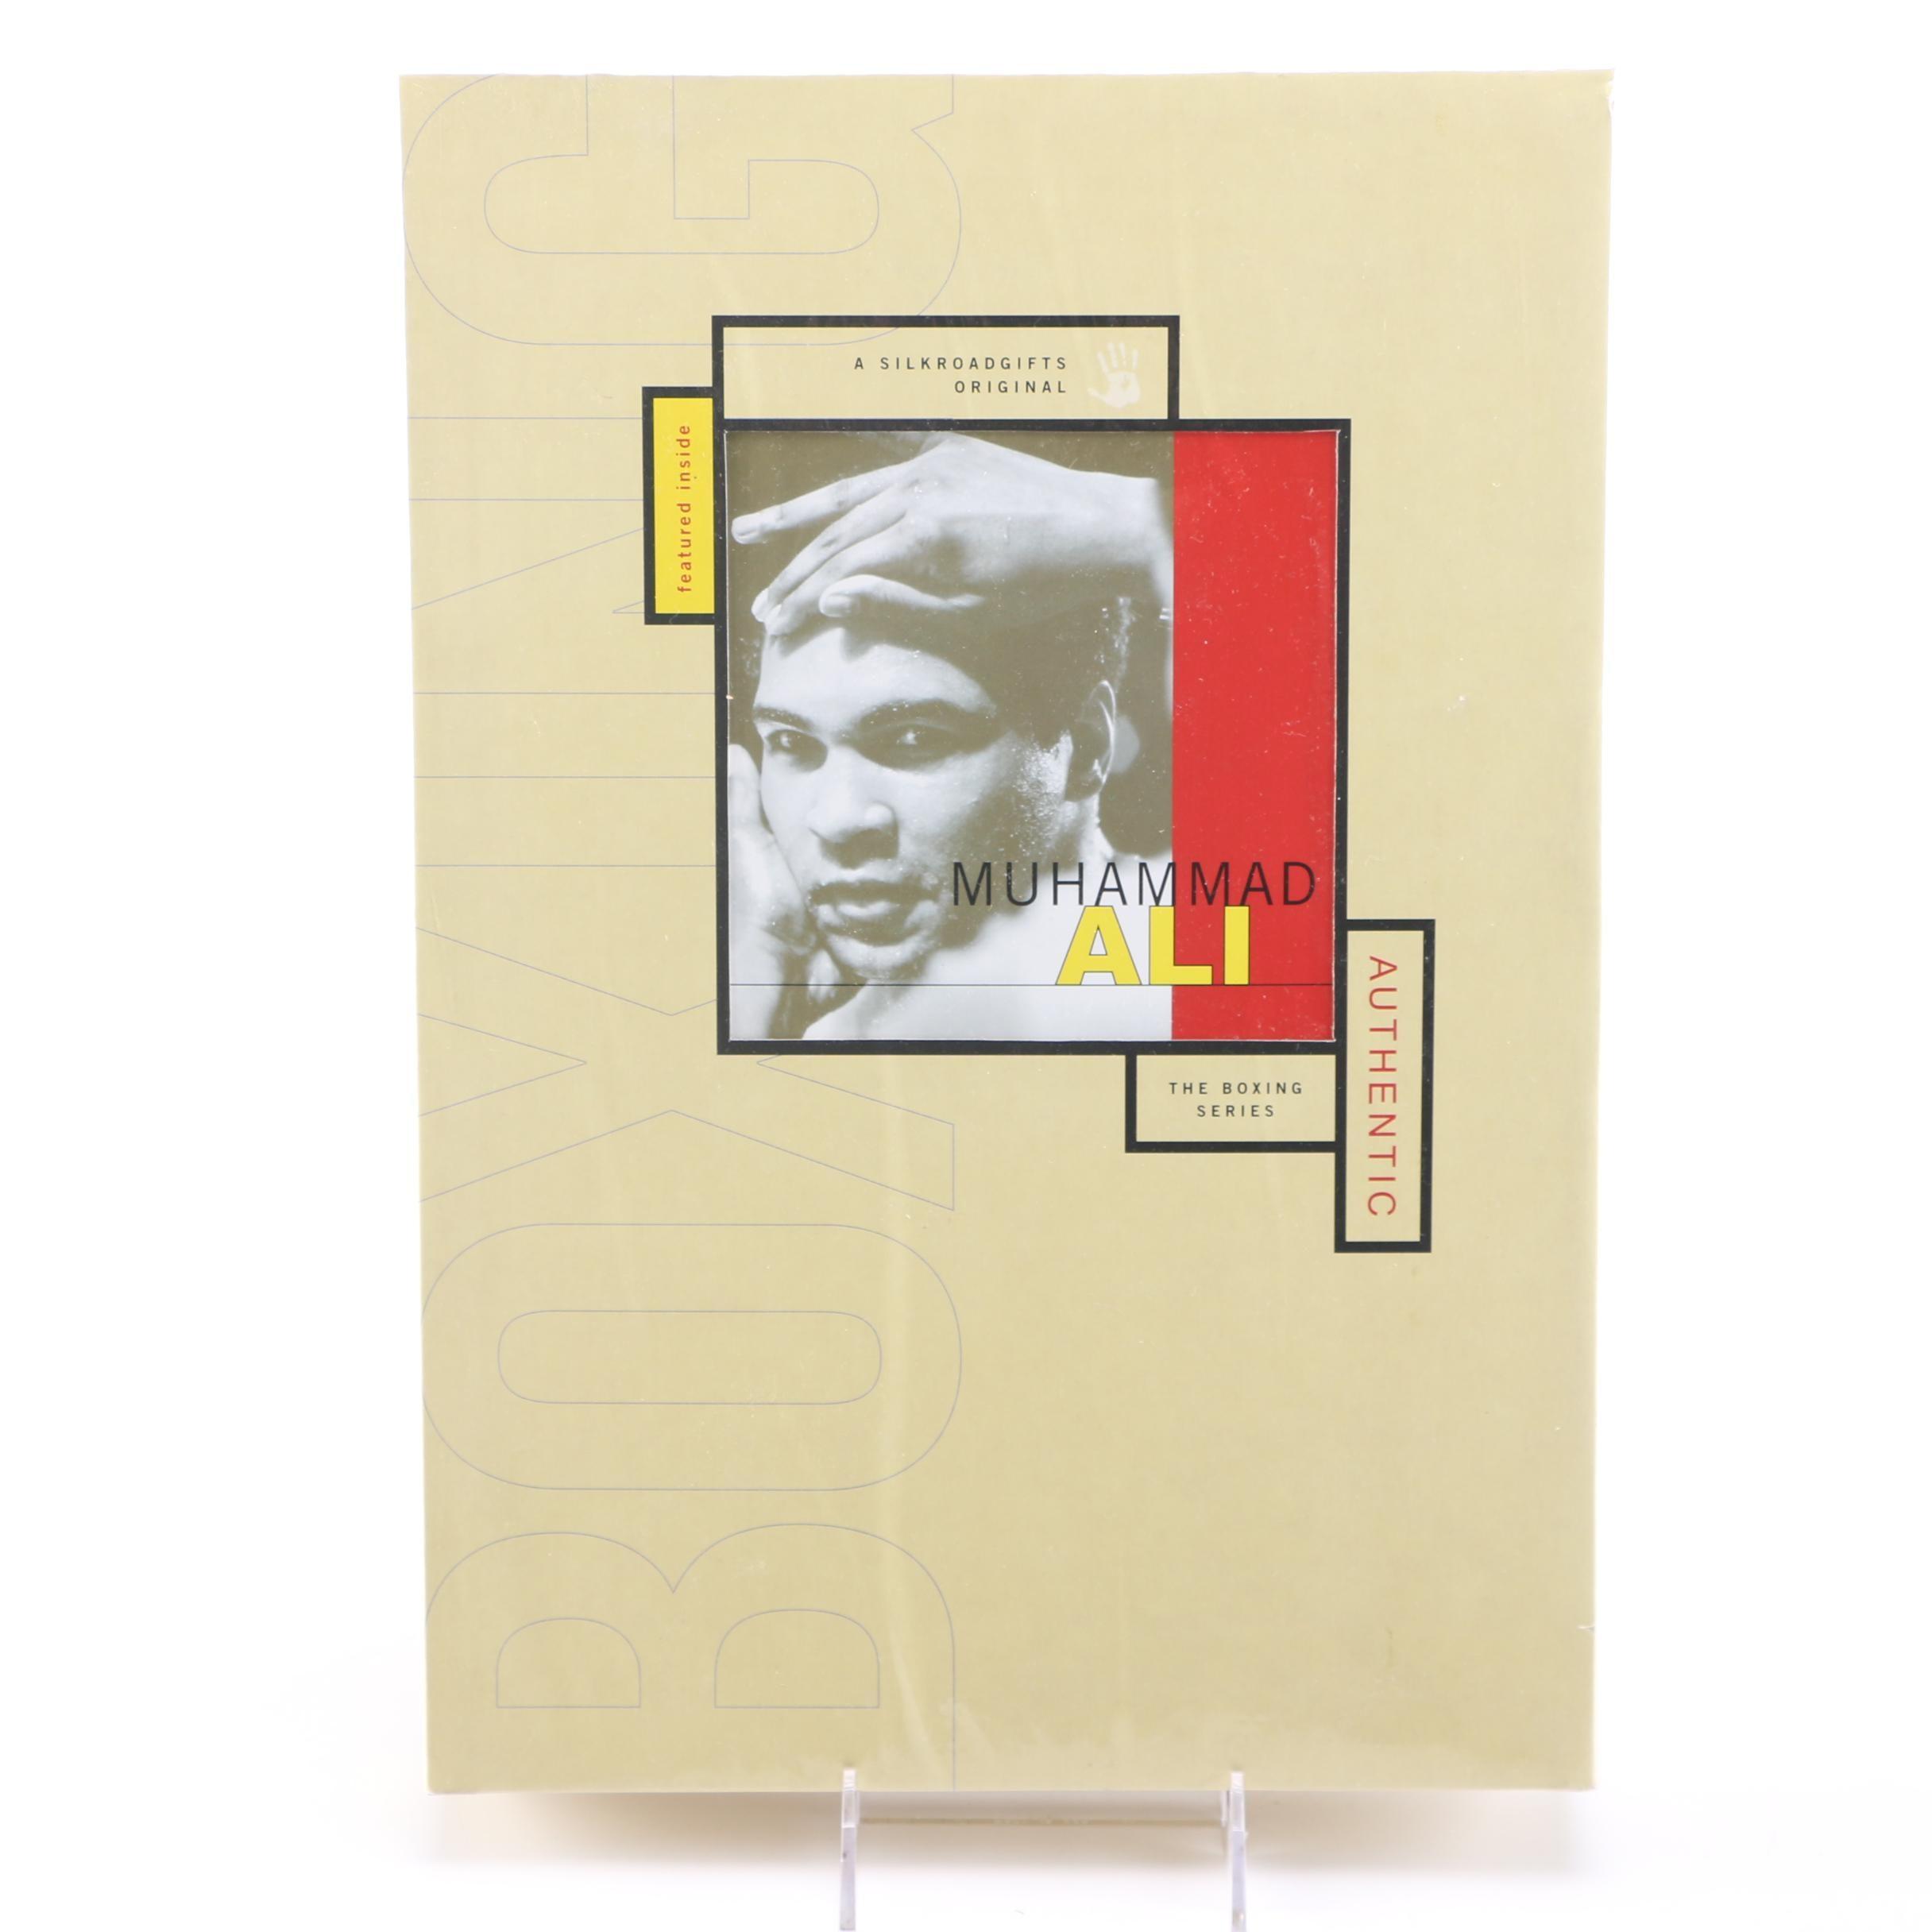 Limited Edition Hand-print of Muhammad Ali